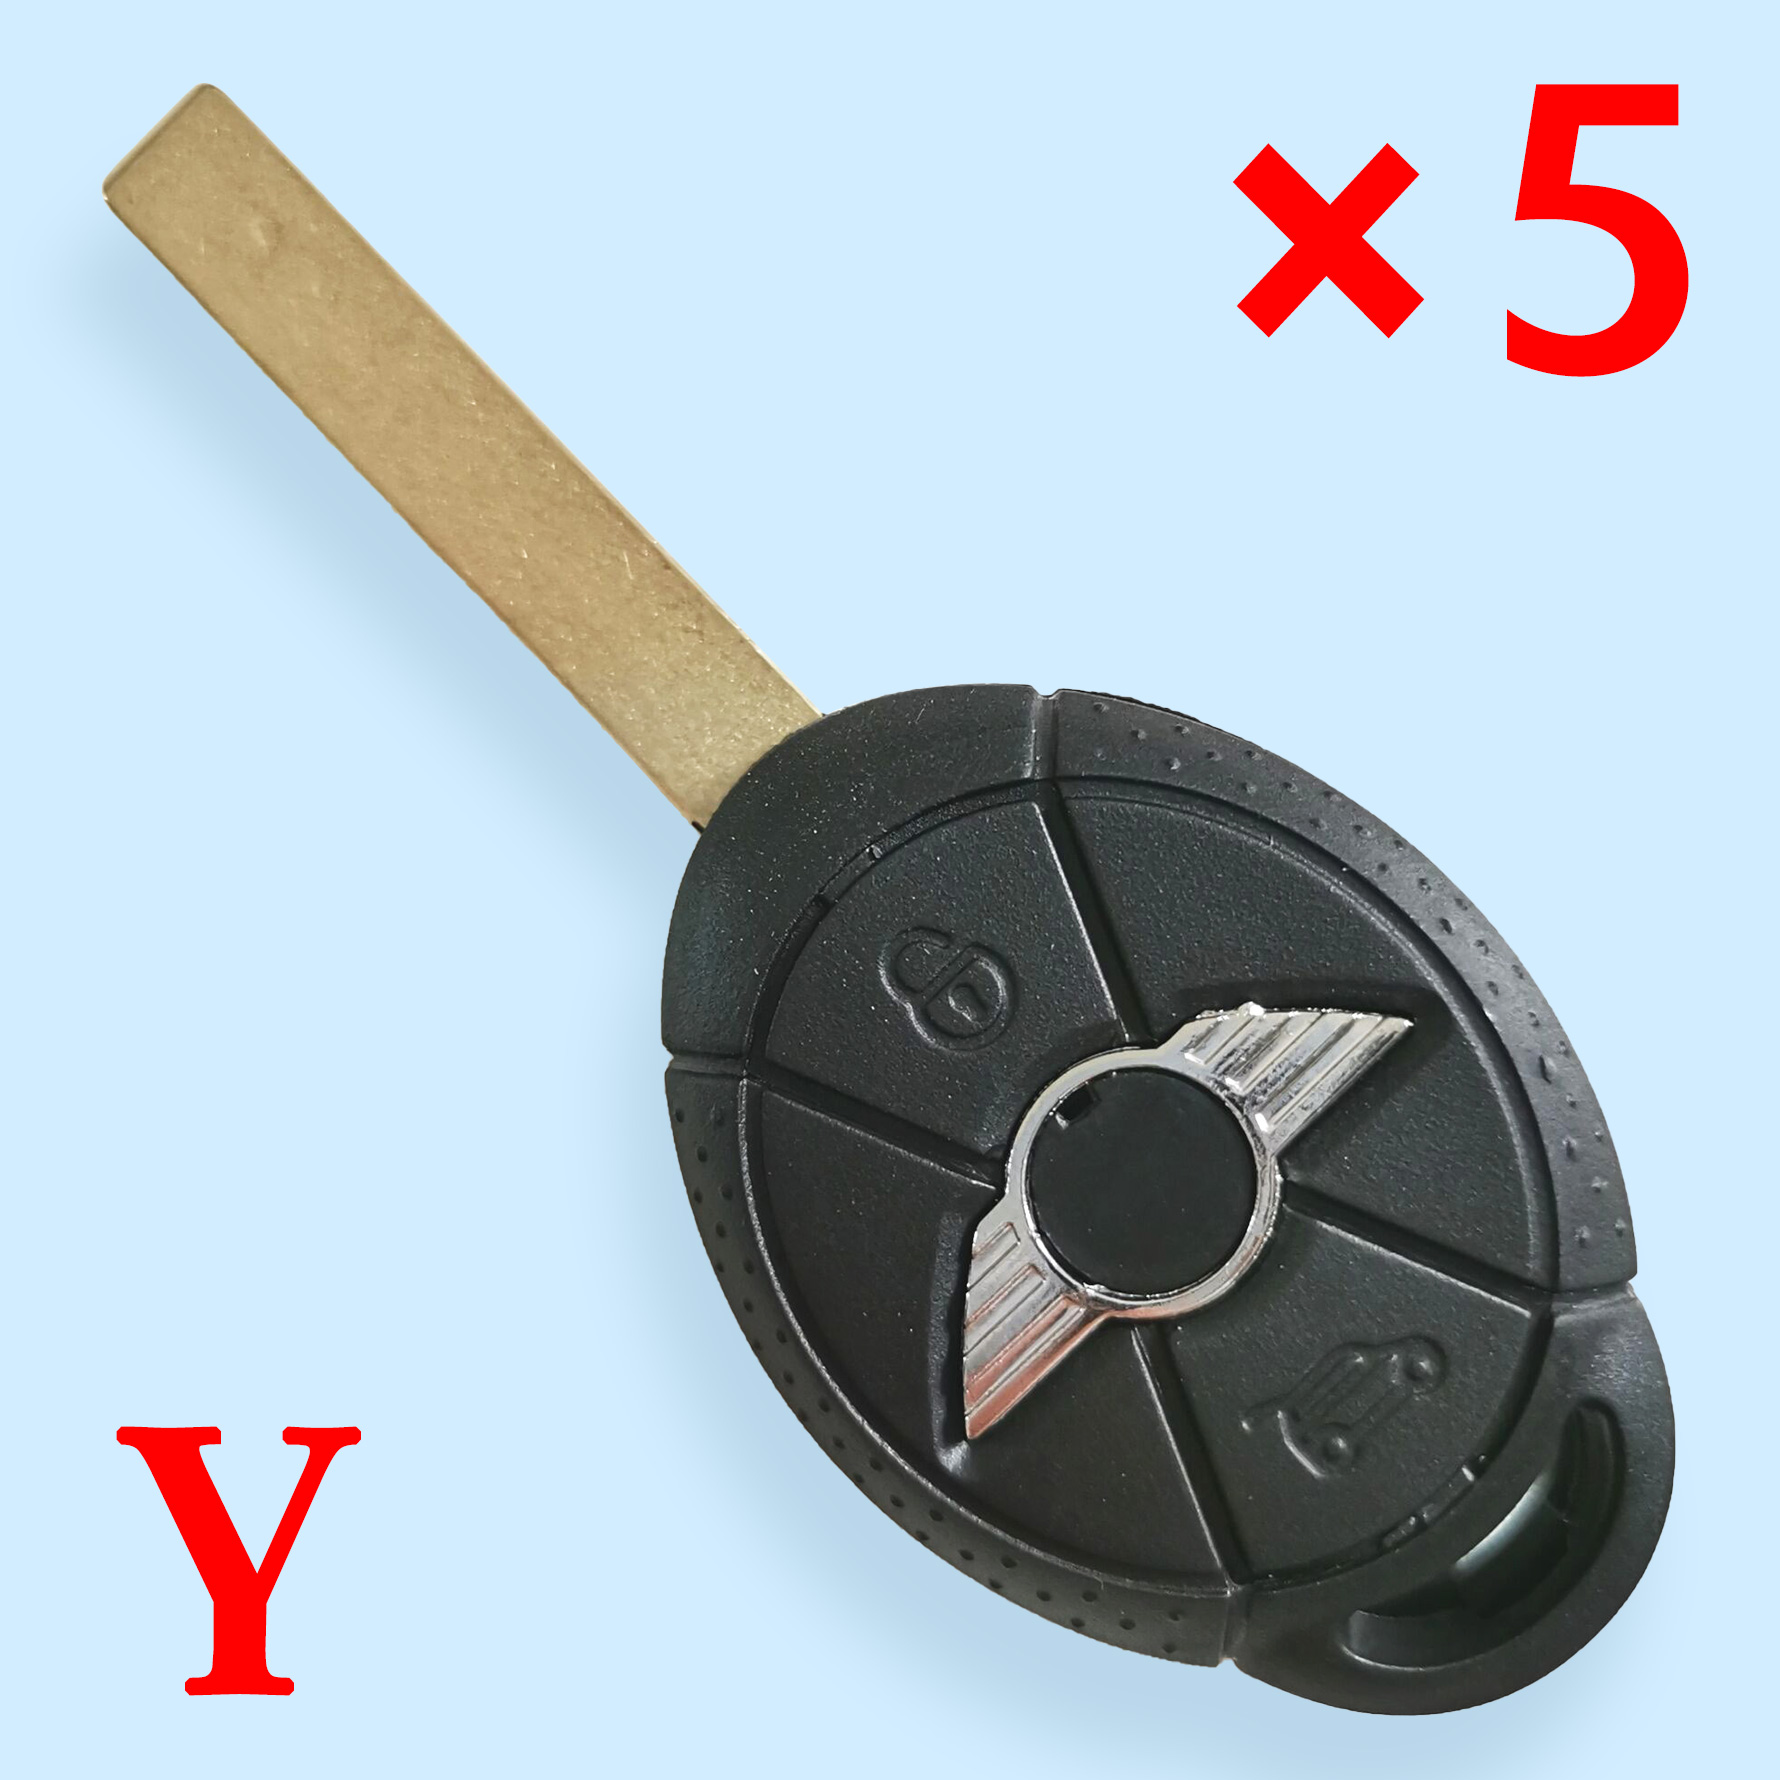 3 Buttons Key Shell for Mini Cooper - 5 pcs